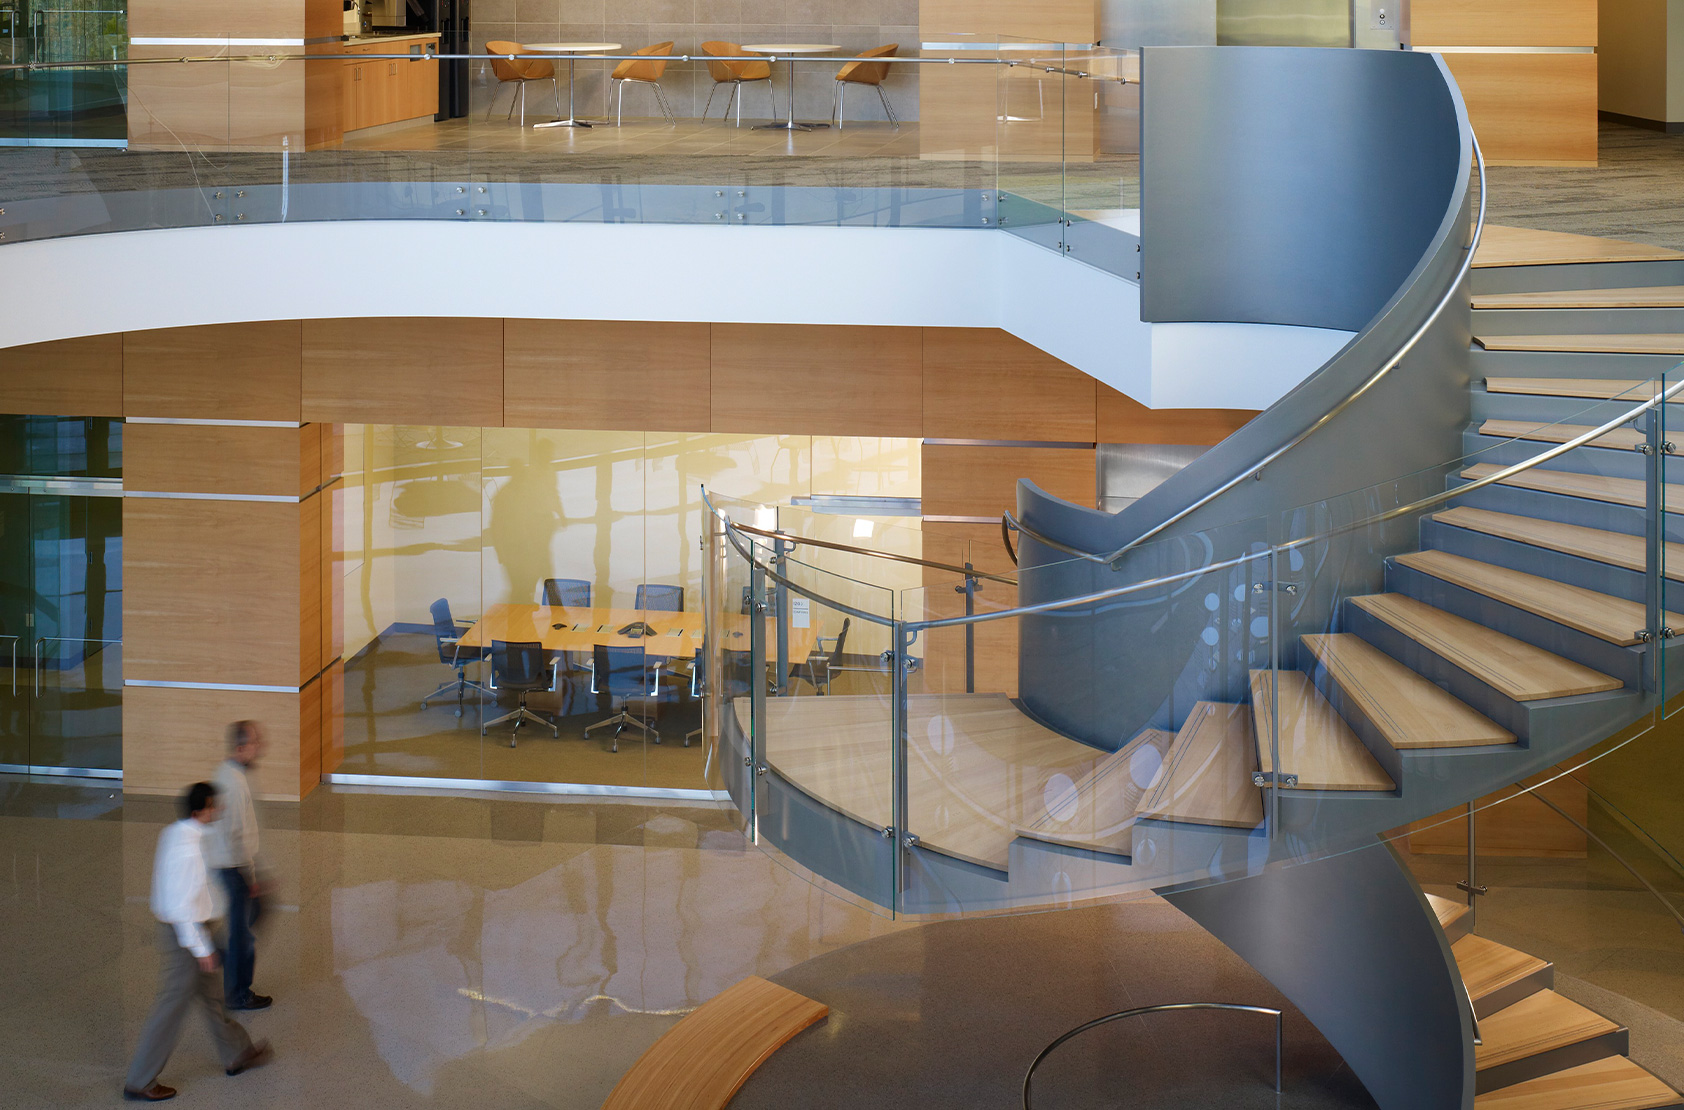 Novartis - USFCC QA-QC Testing & Administration Facility